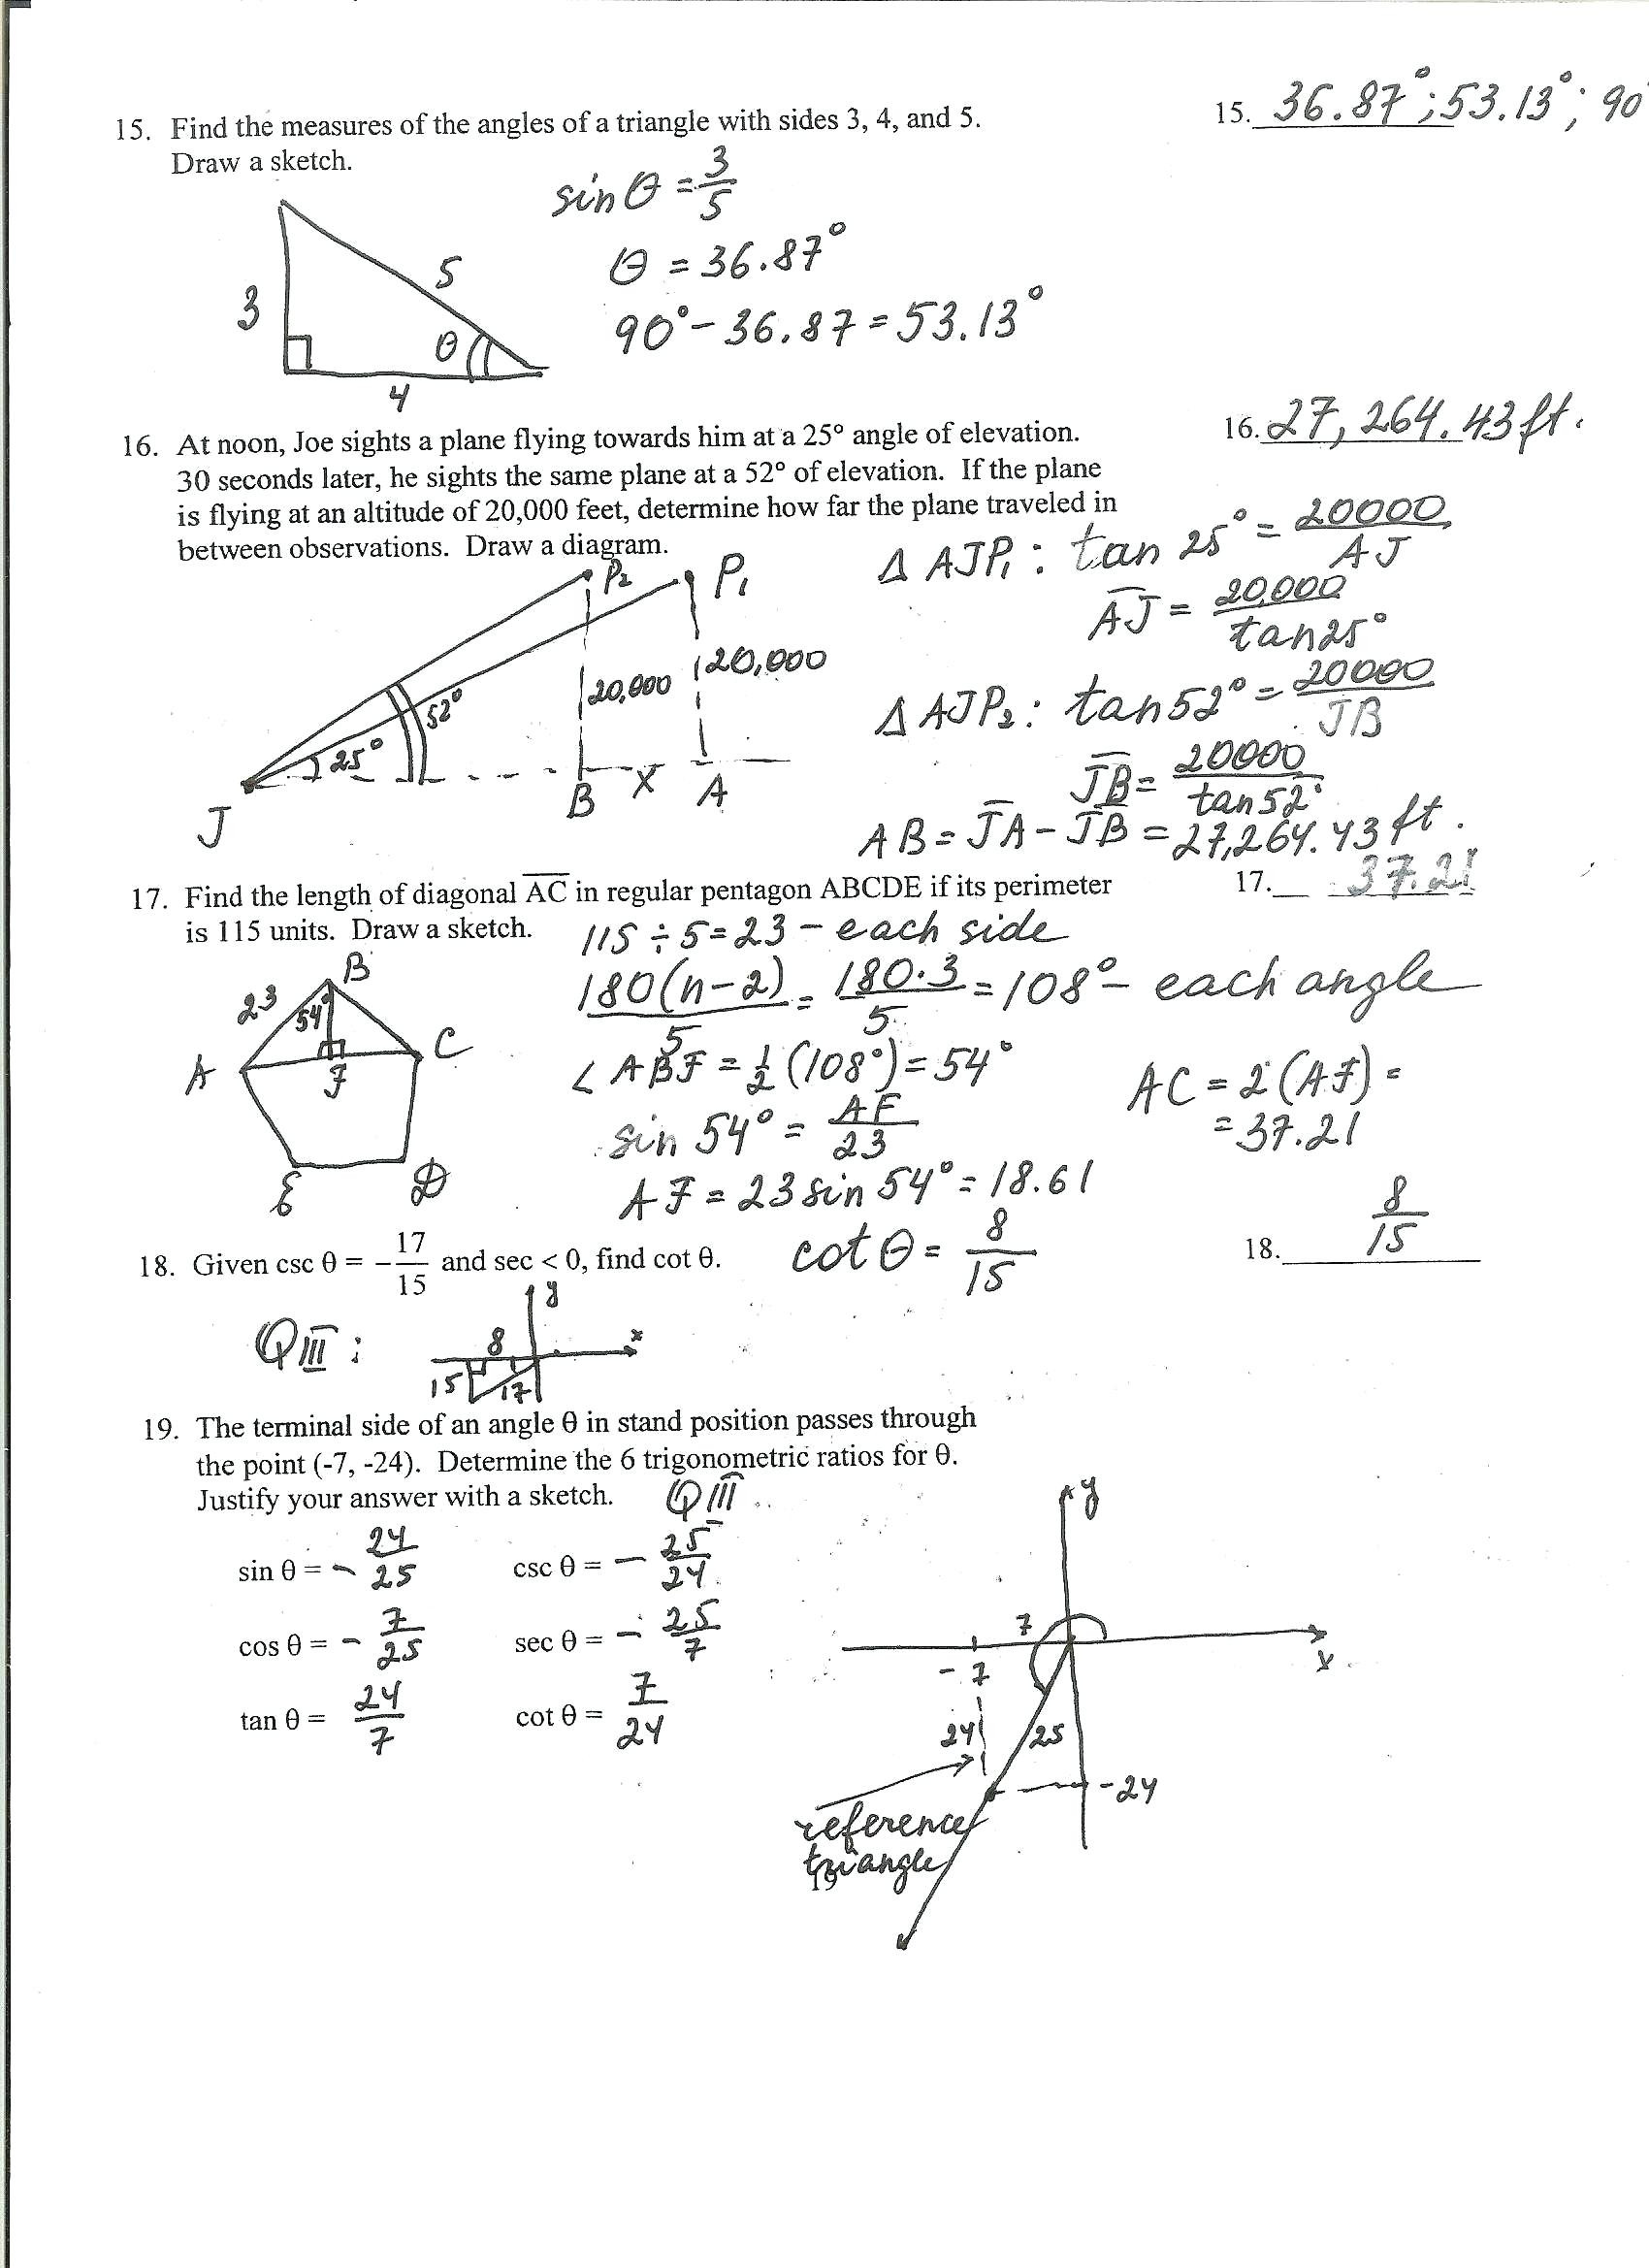 trig identities worksheet math inverse trigonometric ratios worksheet answers luxury trigonometric ratios worksheet answers document design ideas of inverse trig identities worksheet 34 answers